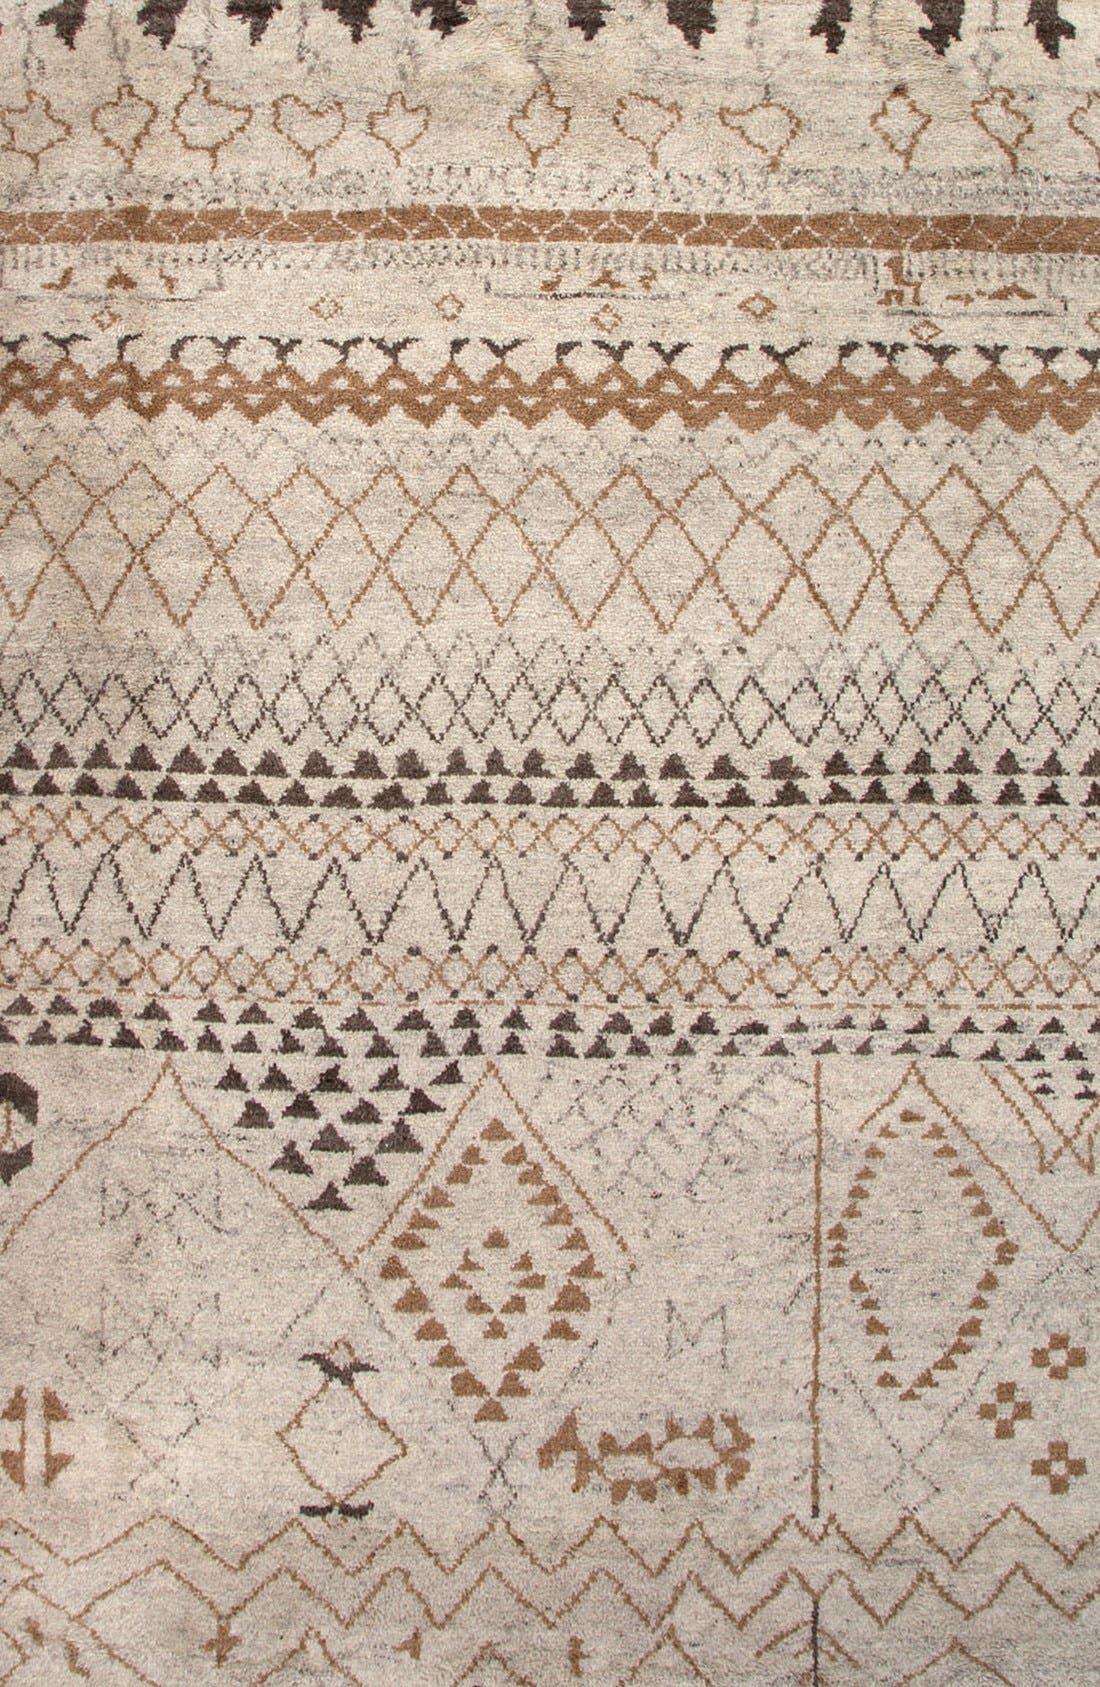 JAIPUR 'Zola Zag' Wool Area Rug